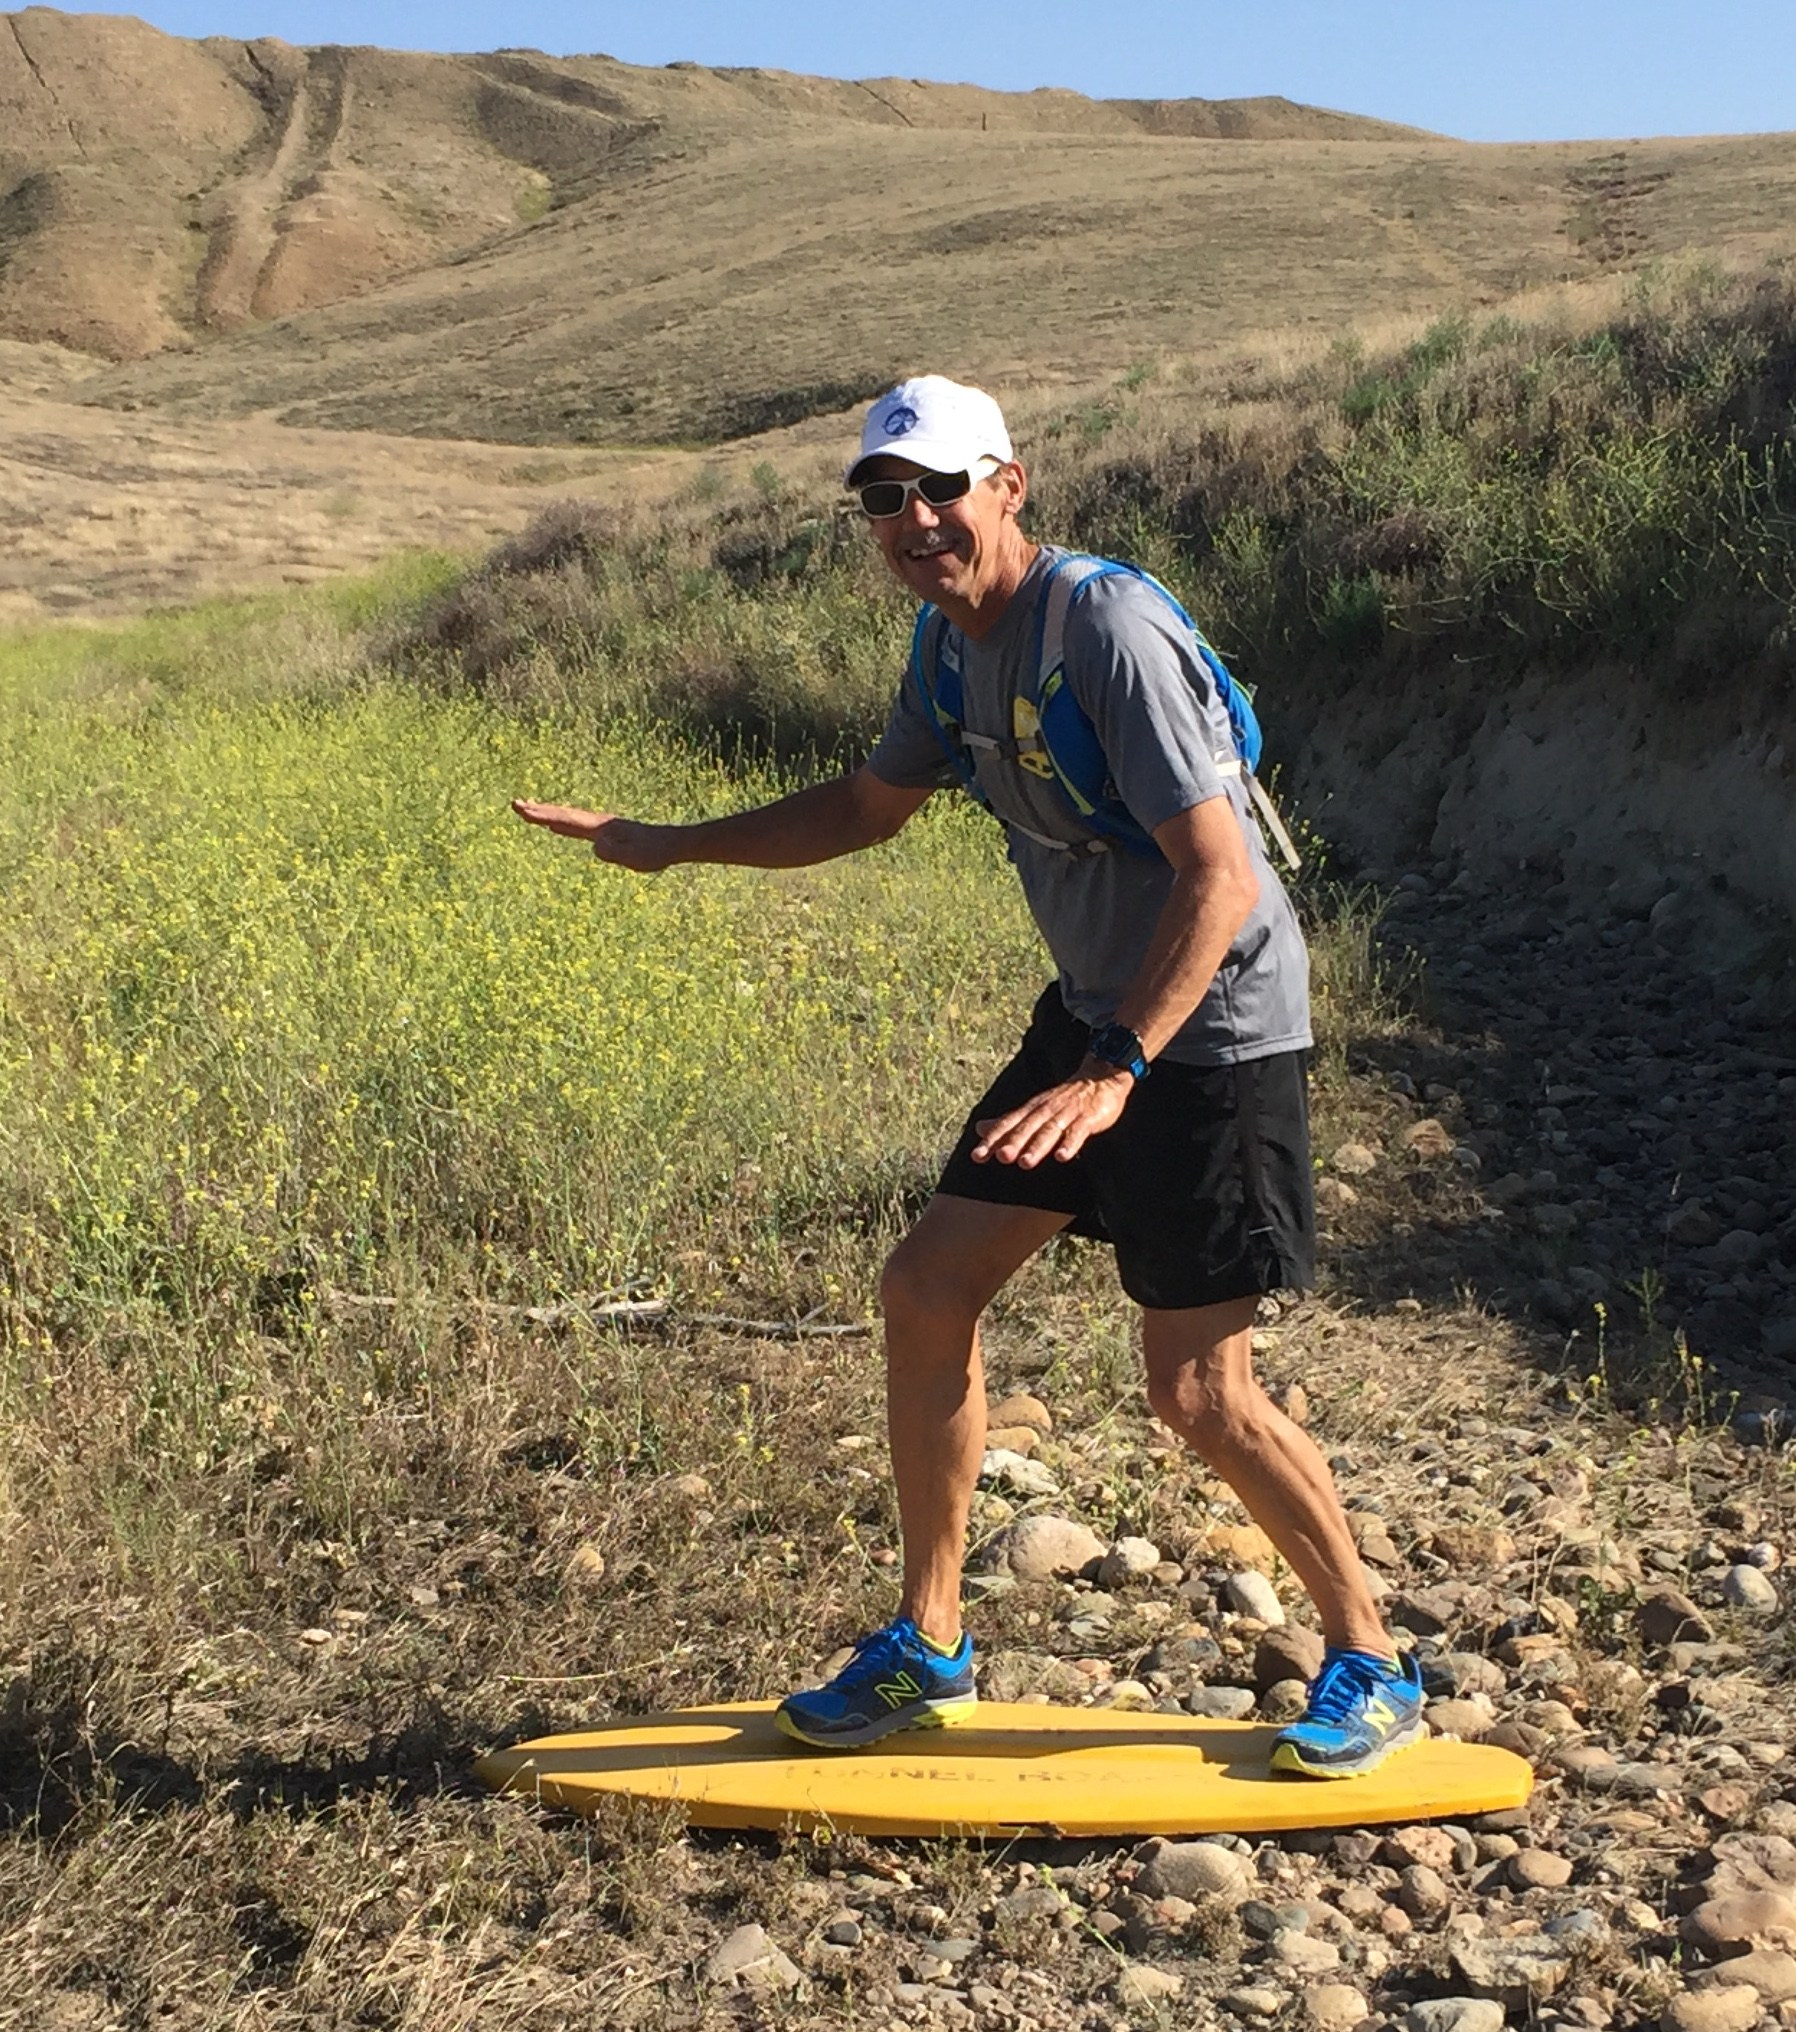 Pretending to surf during a trail run.